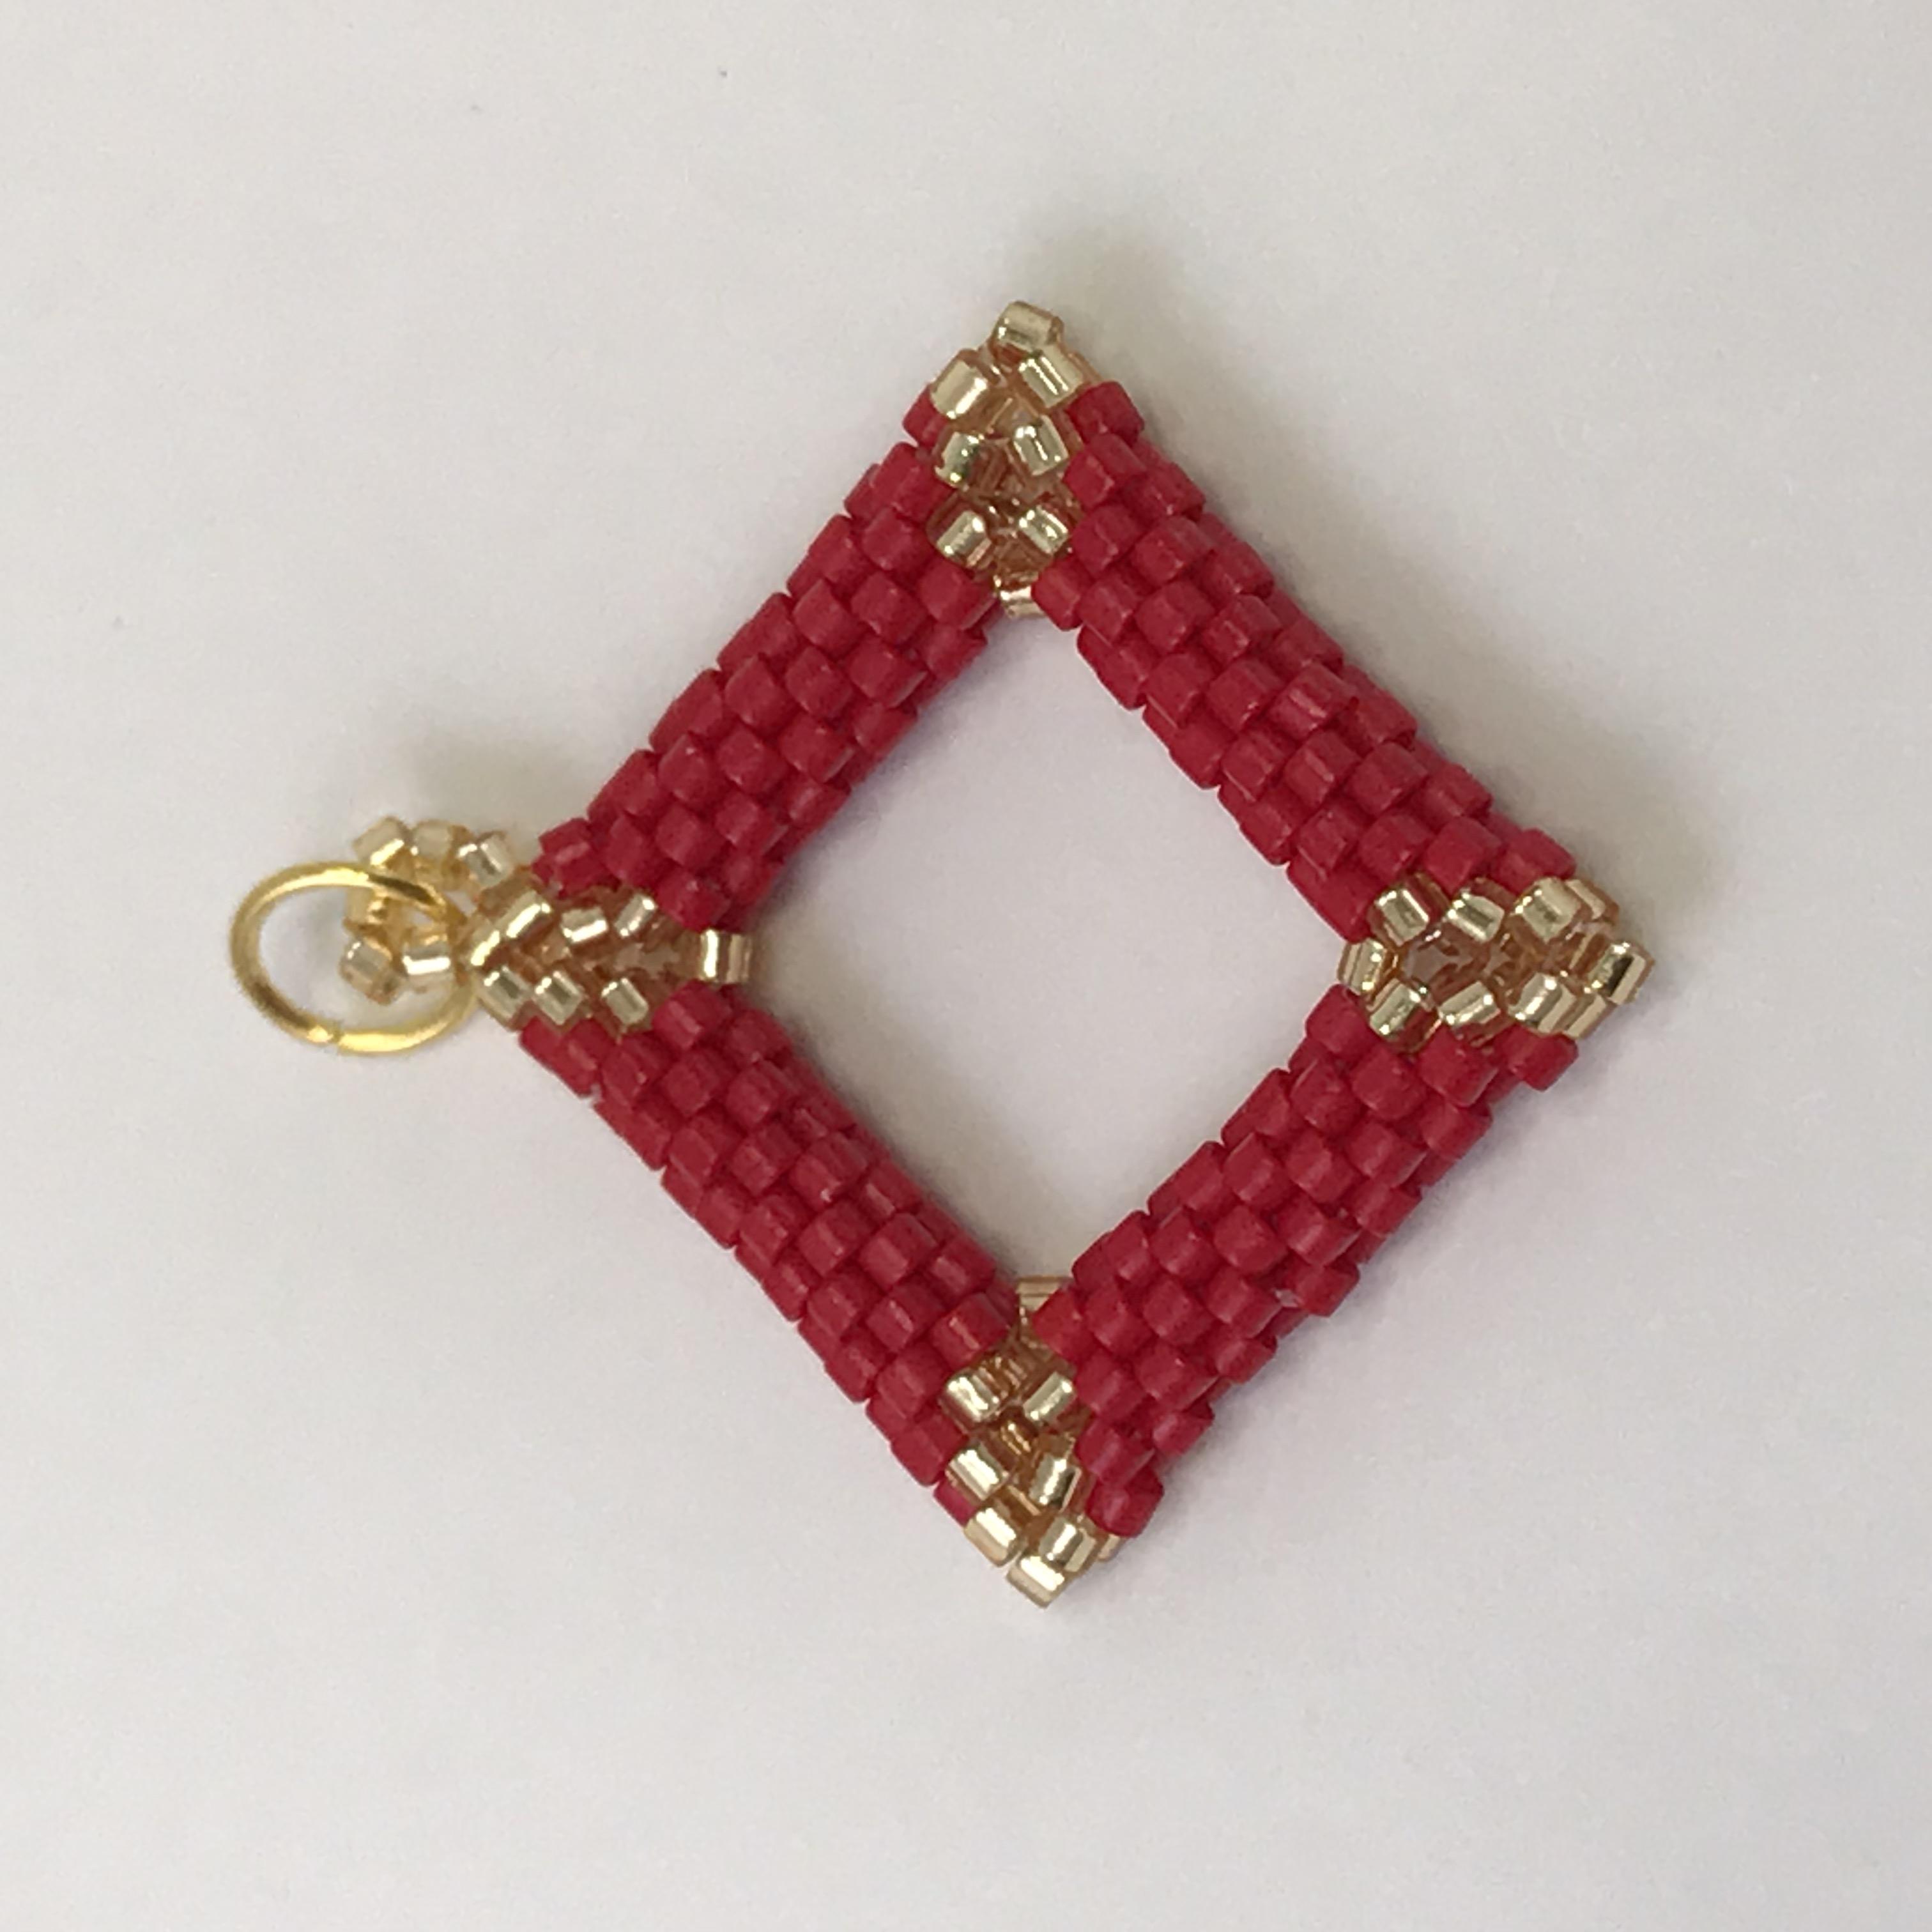 Dark red gold diamond shaped pendant buy me something pretty dark red gold diamond shaped pendant aloadofball Images